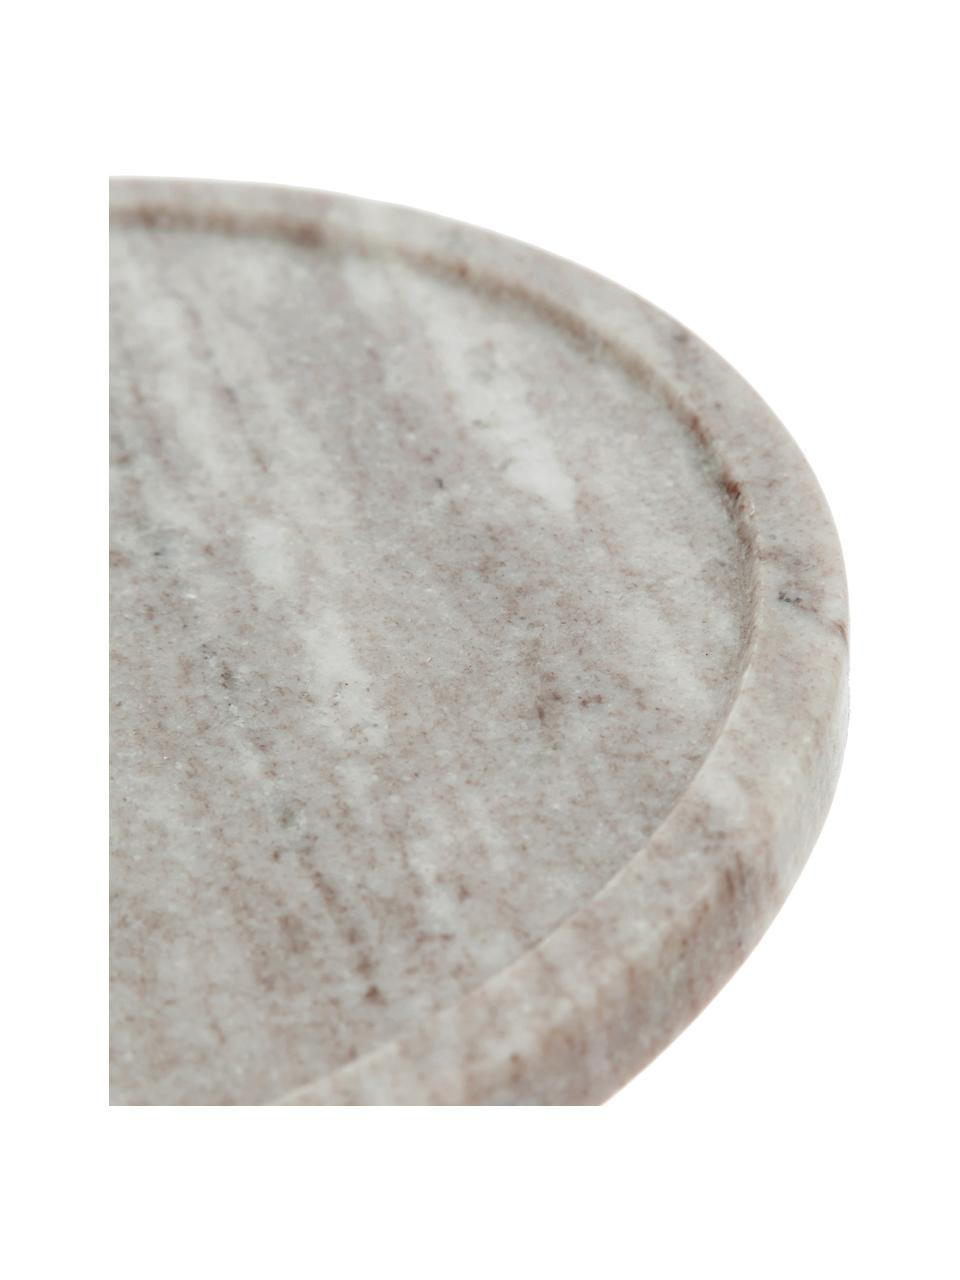 Marmeren kaasstolp Cheese, Ø 25 cm, Stolp: glas, Plank: marmer, Beige, transparant, Ø 25 x H 14 cm